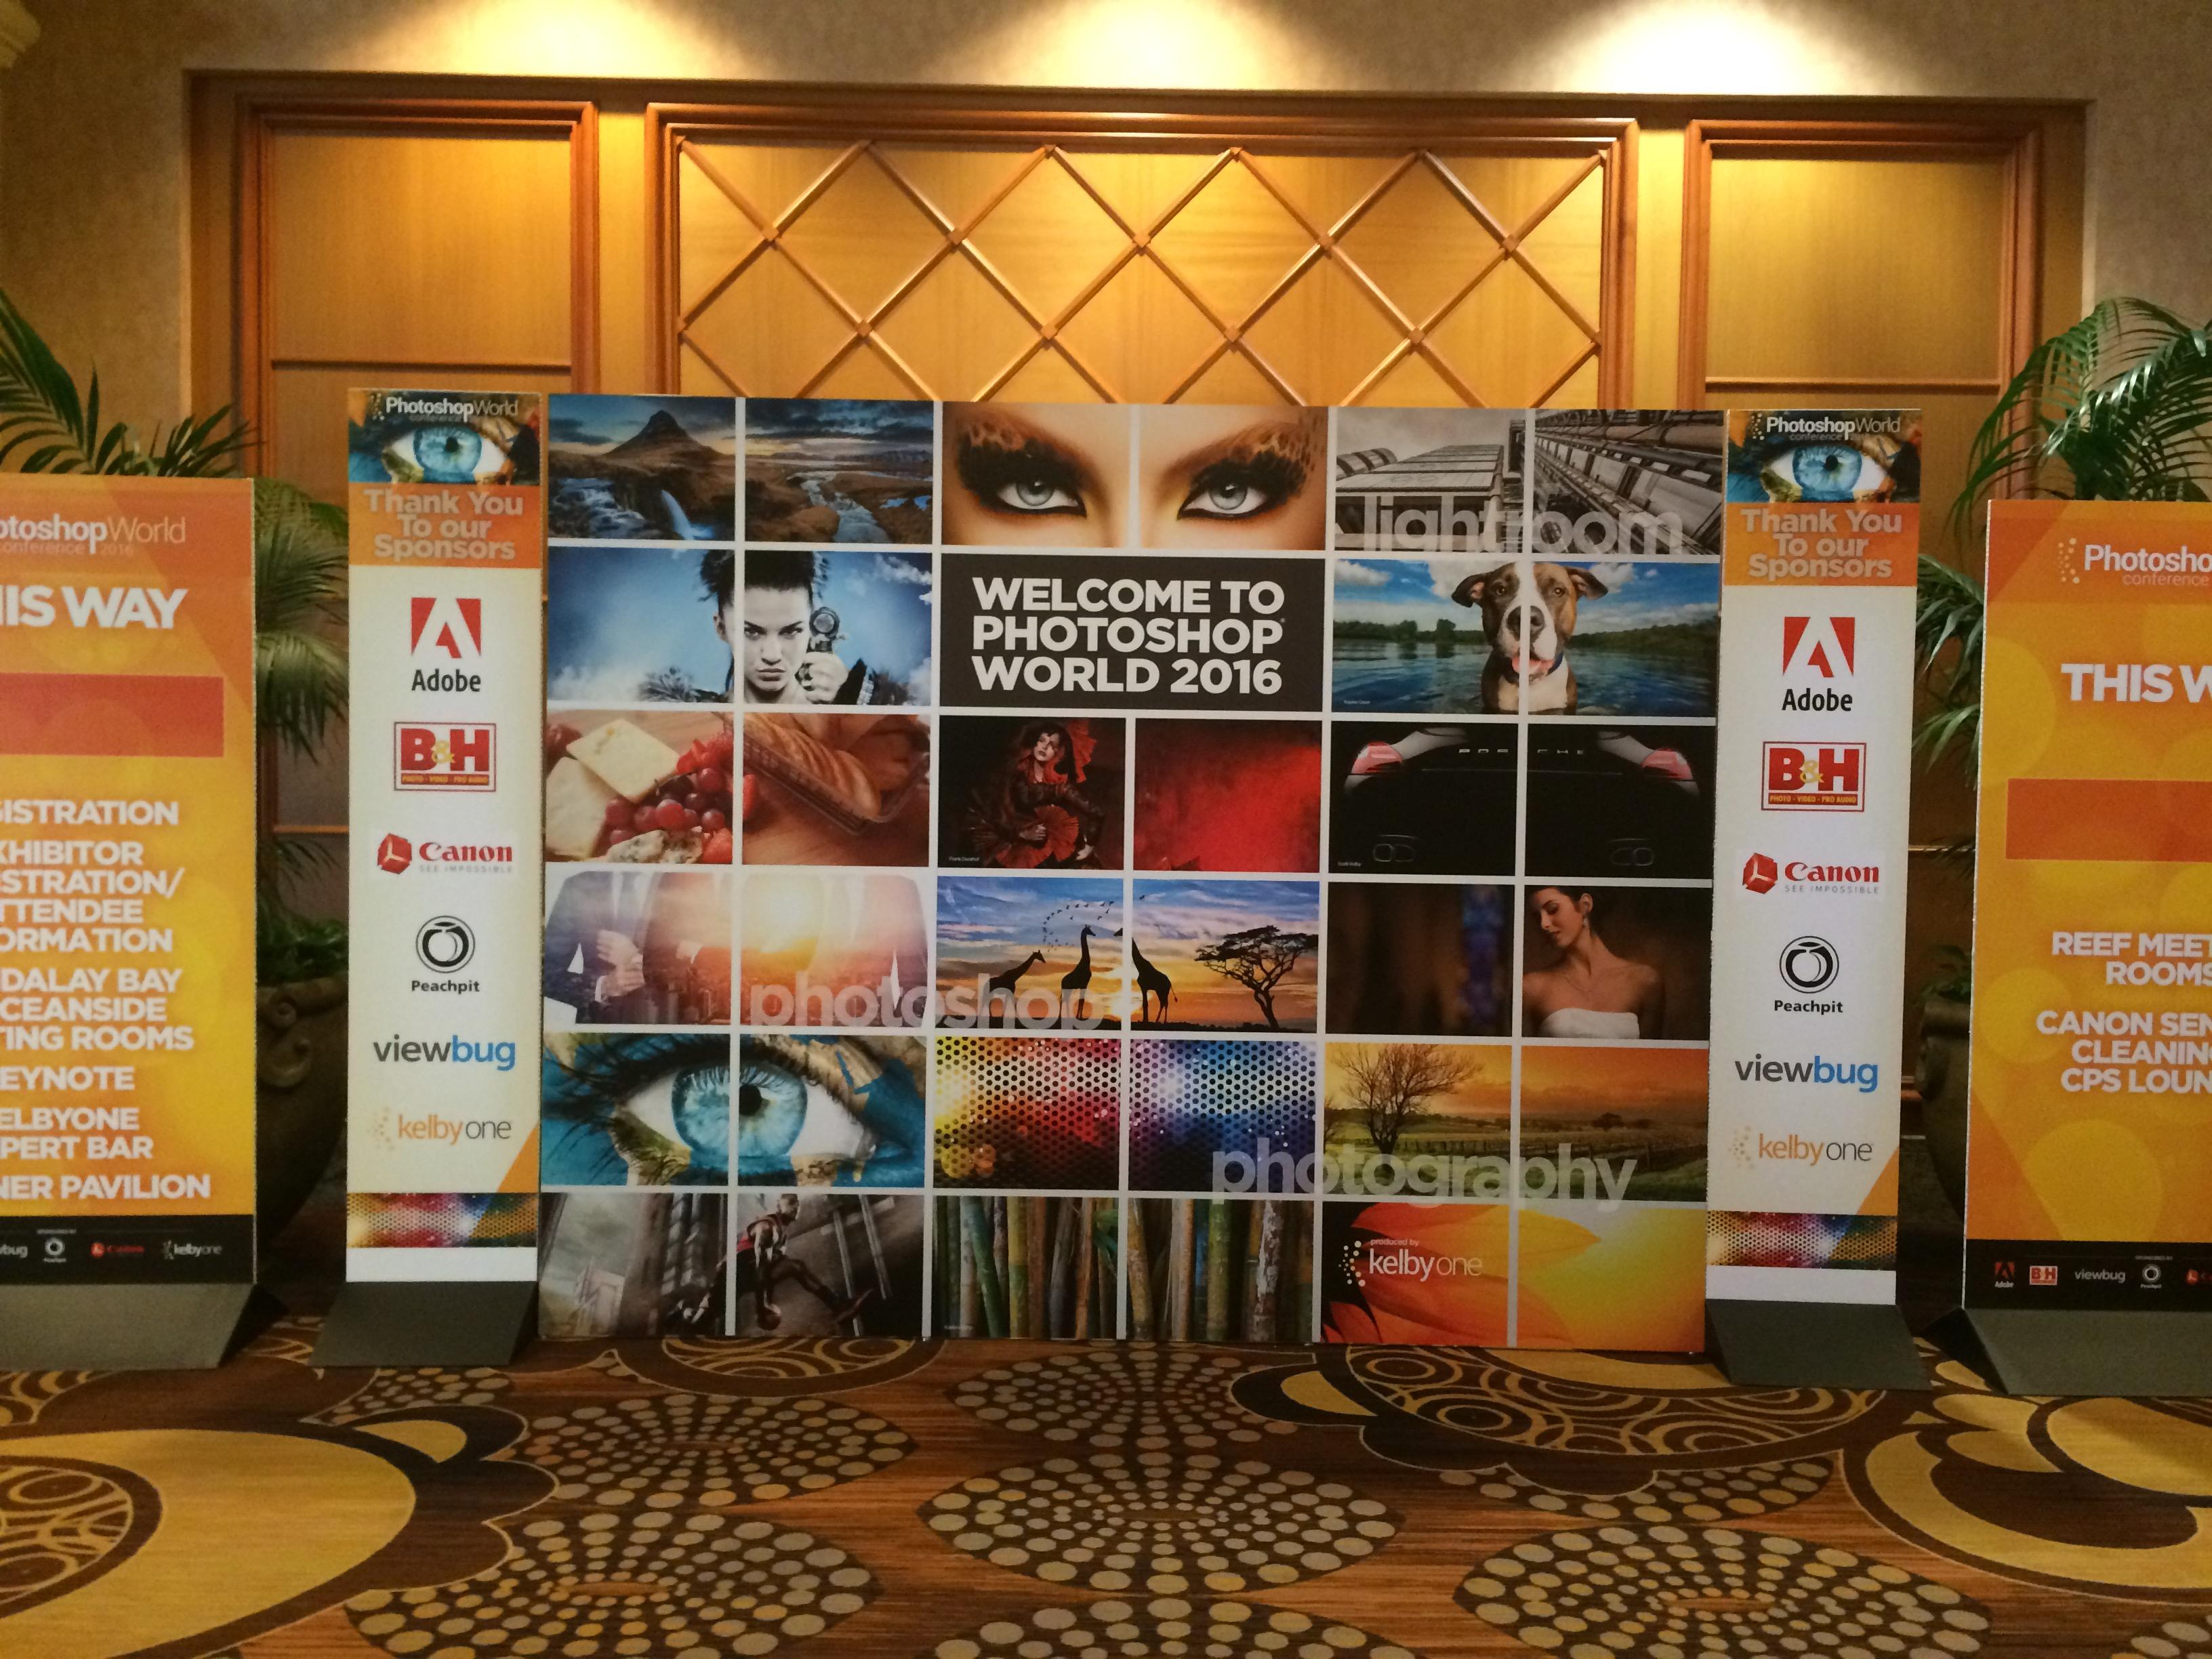 Display Board at Photoshop World 2016